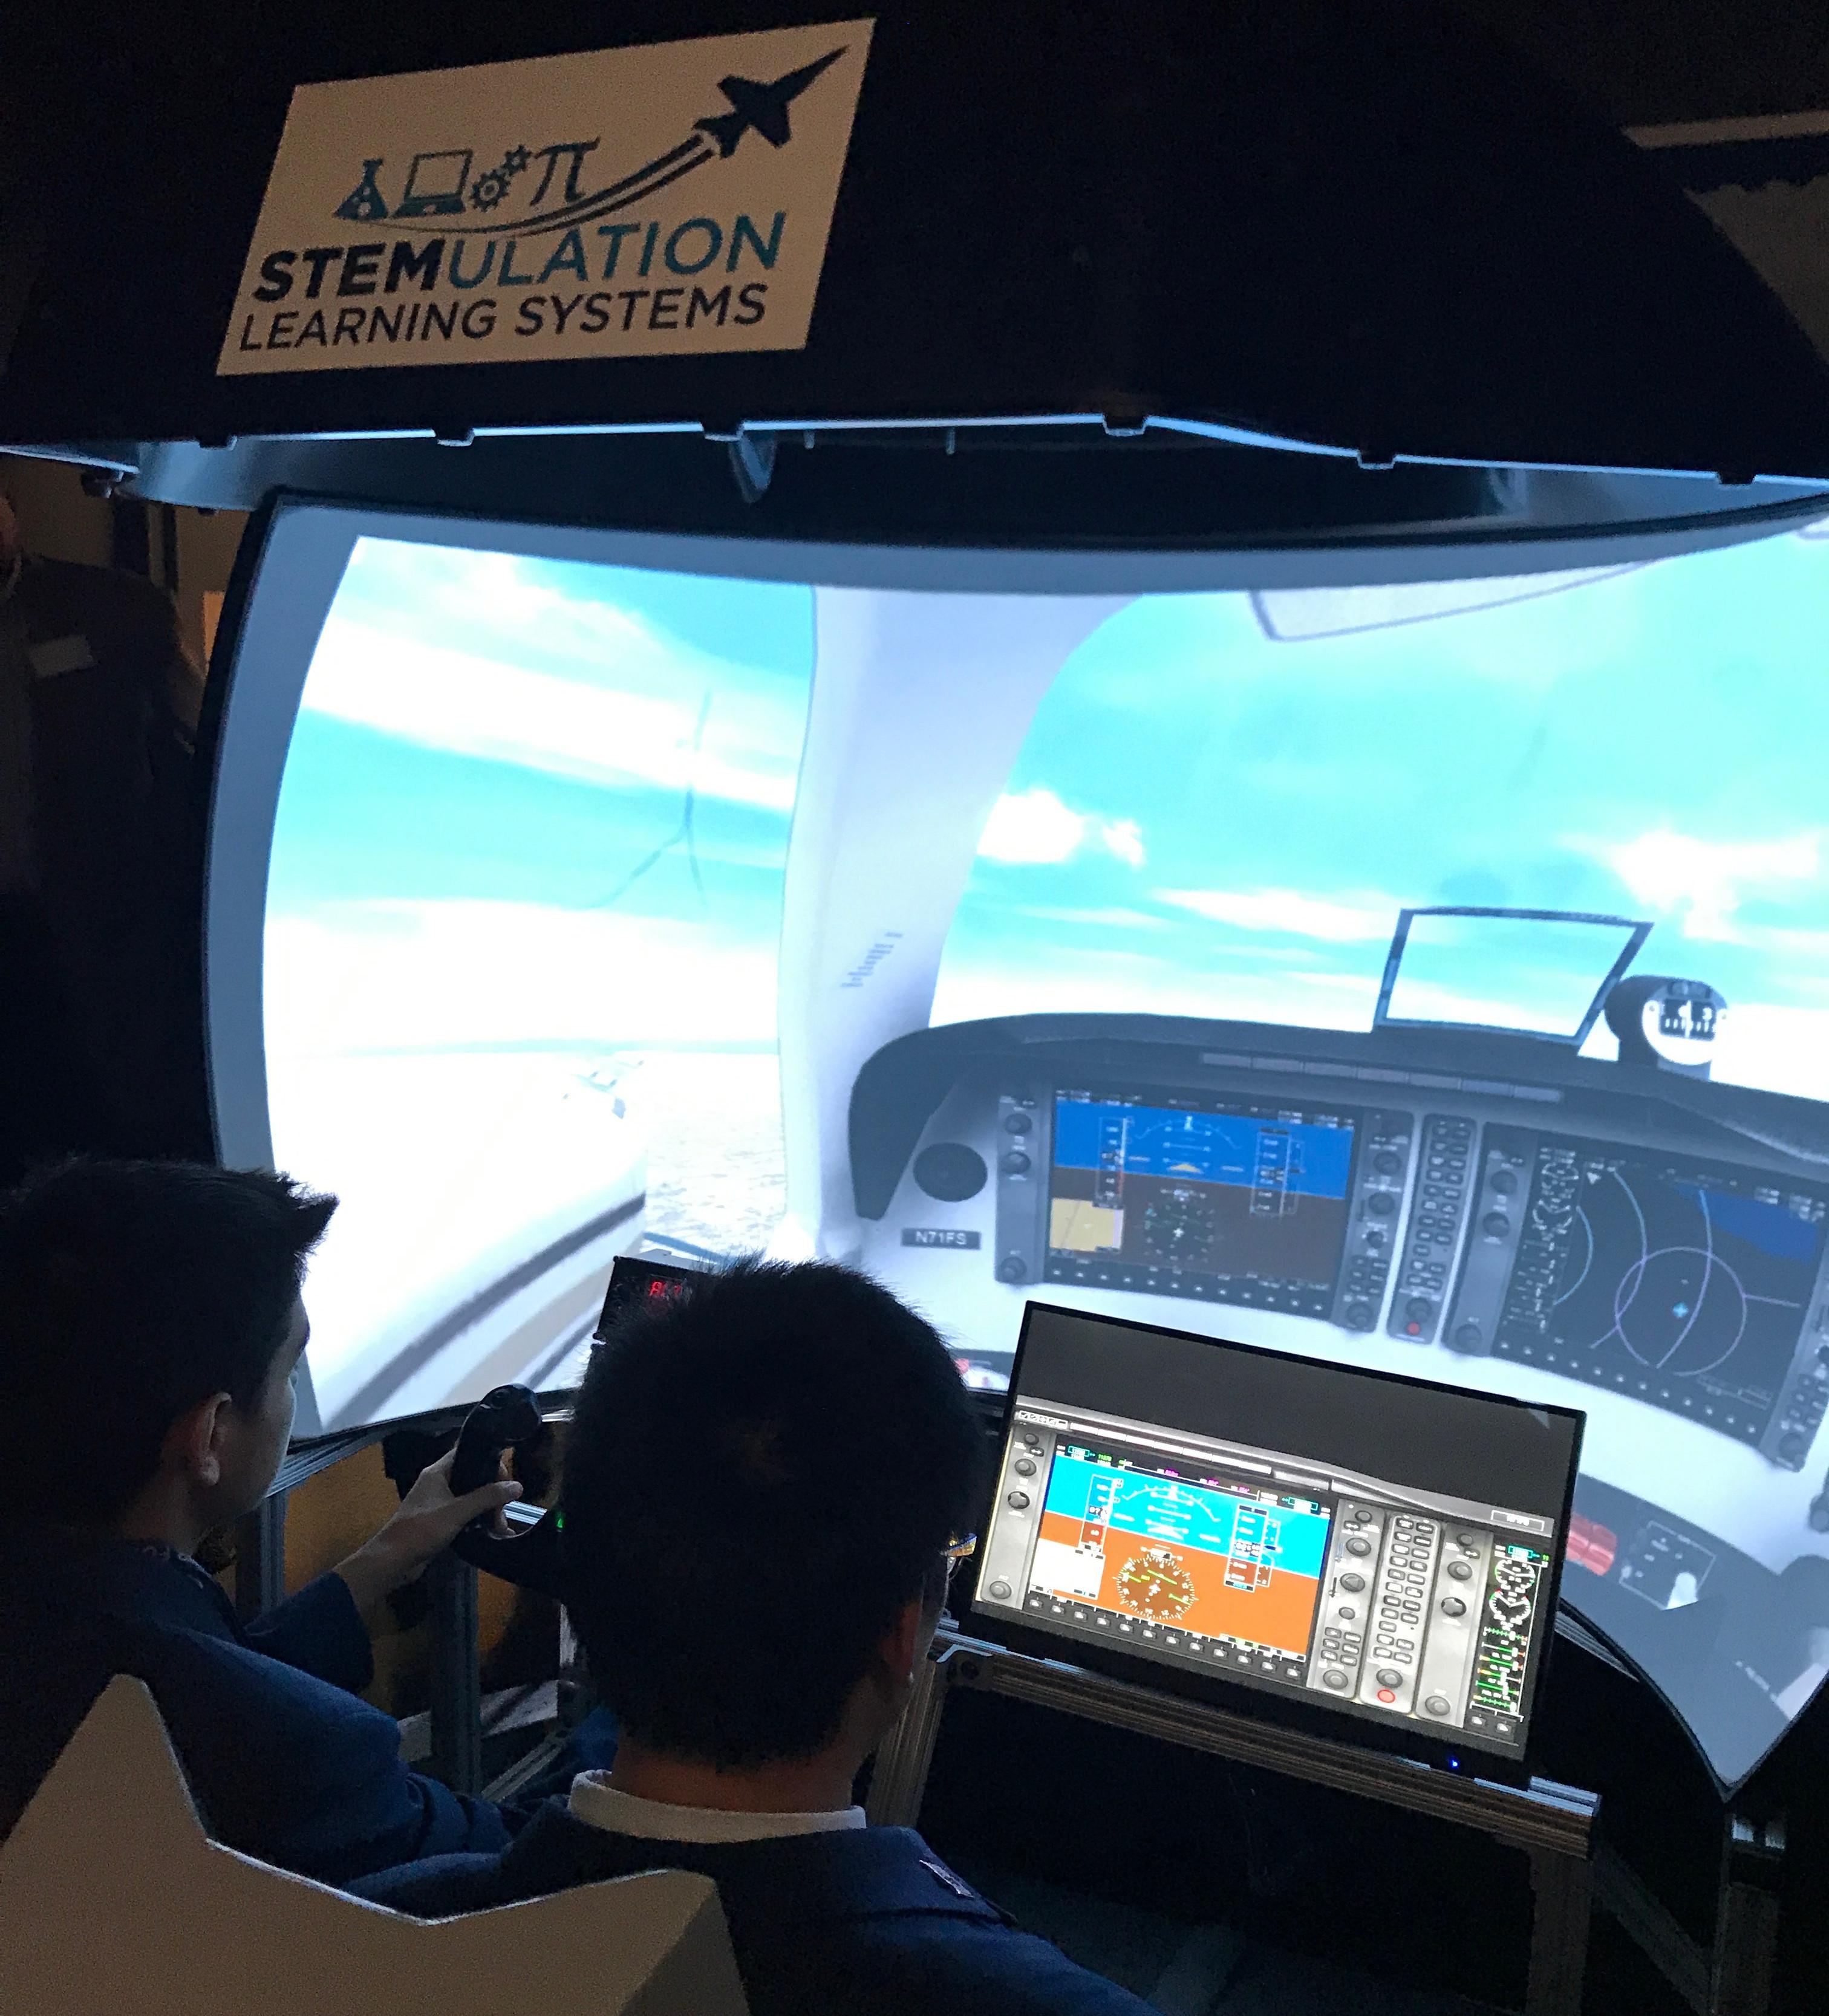 Air Force Academy Flight Simulation Lab